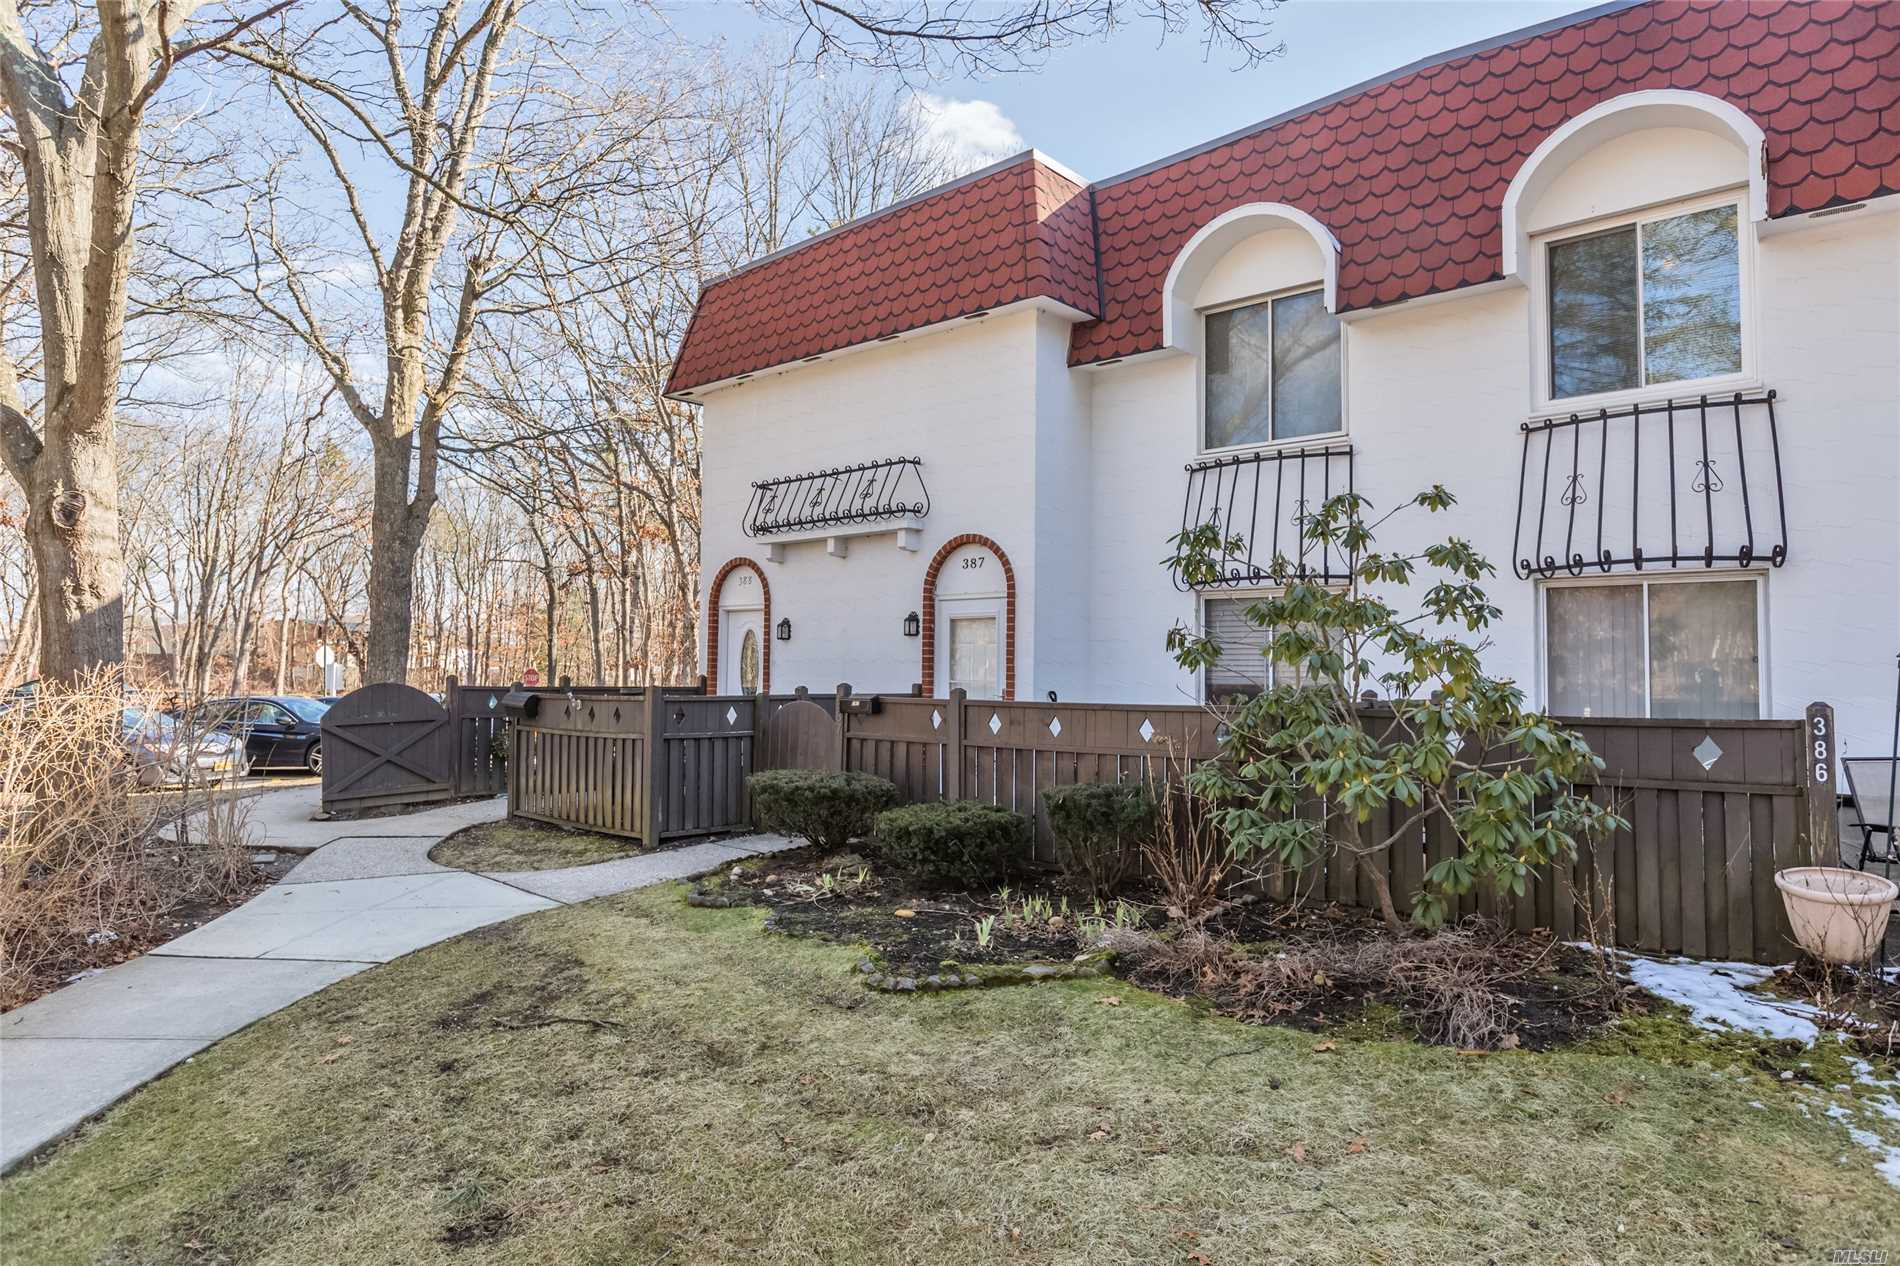 Property for sale at 387 Birchwood Rd, Medford,  NY 11763